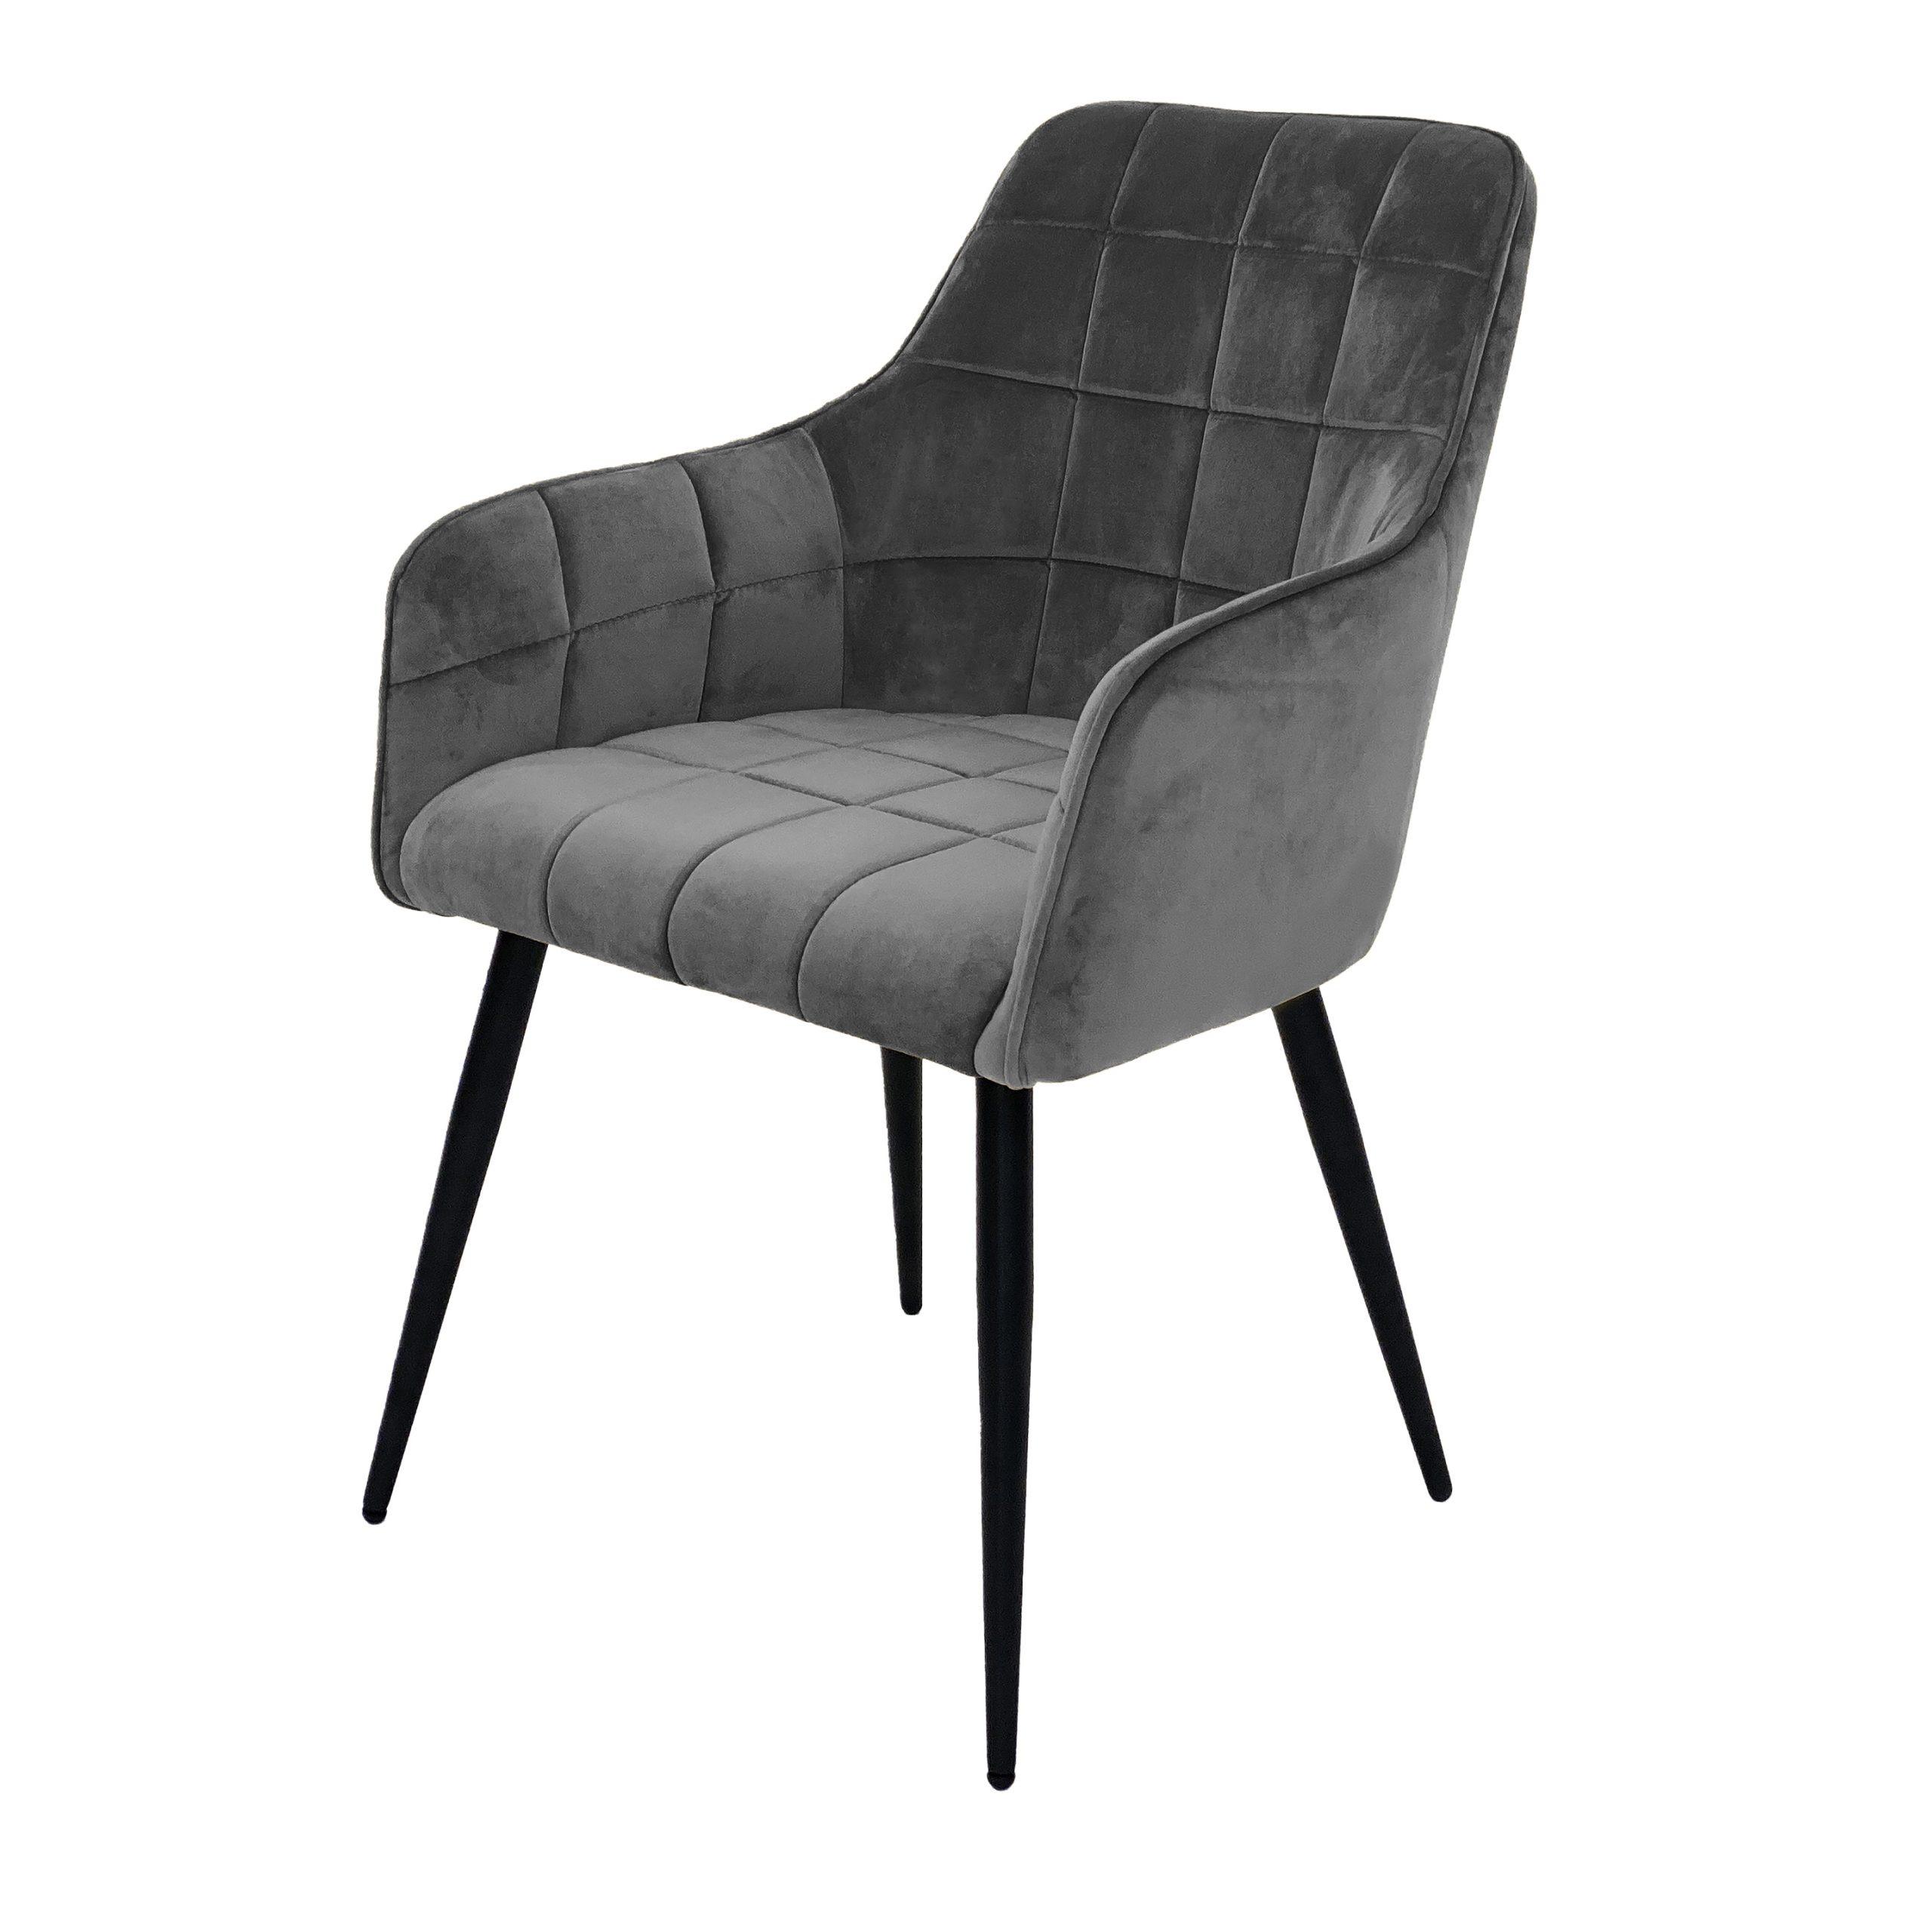 Evie grey velvet dining chairs